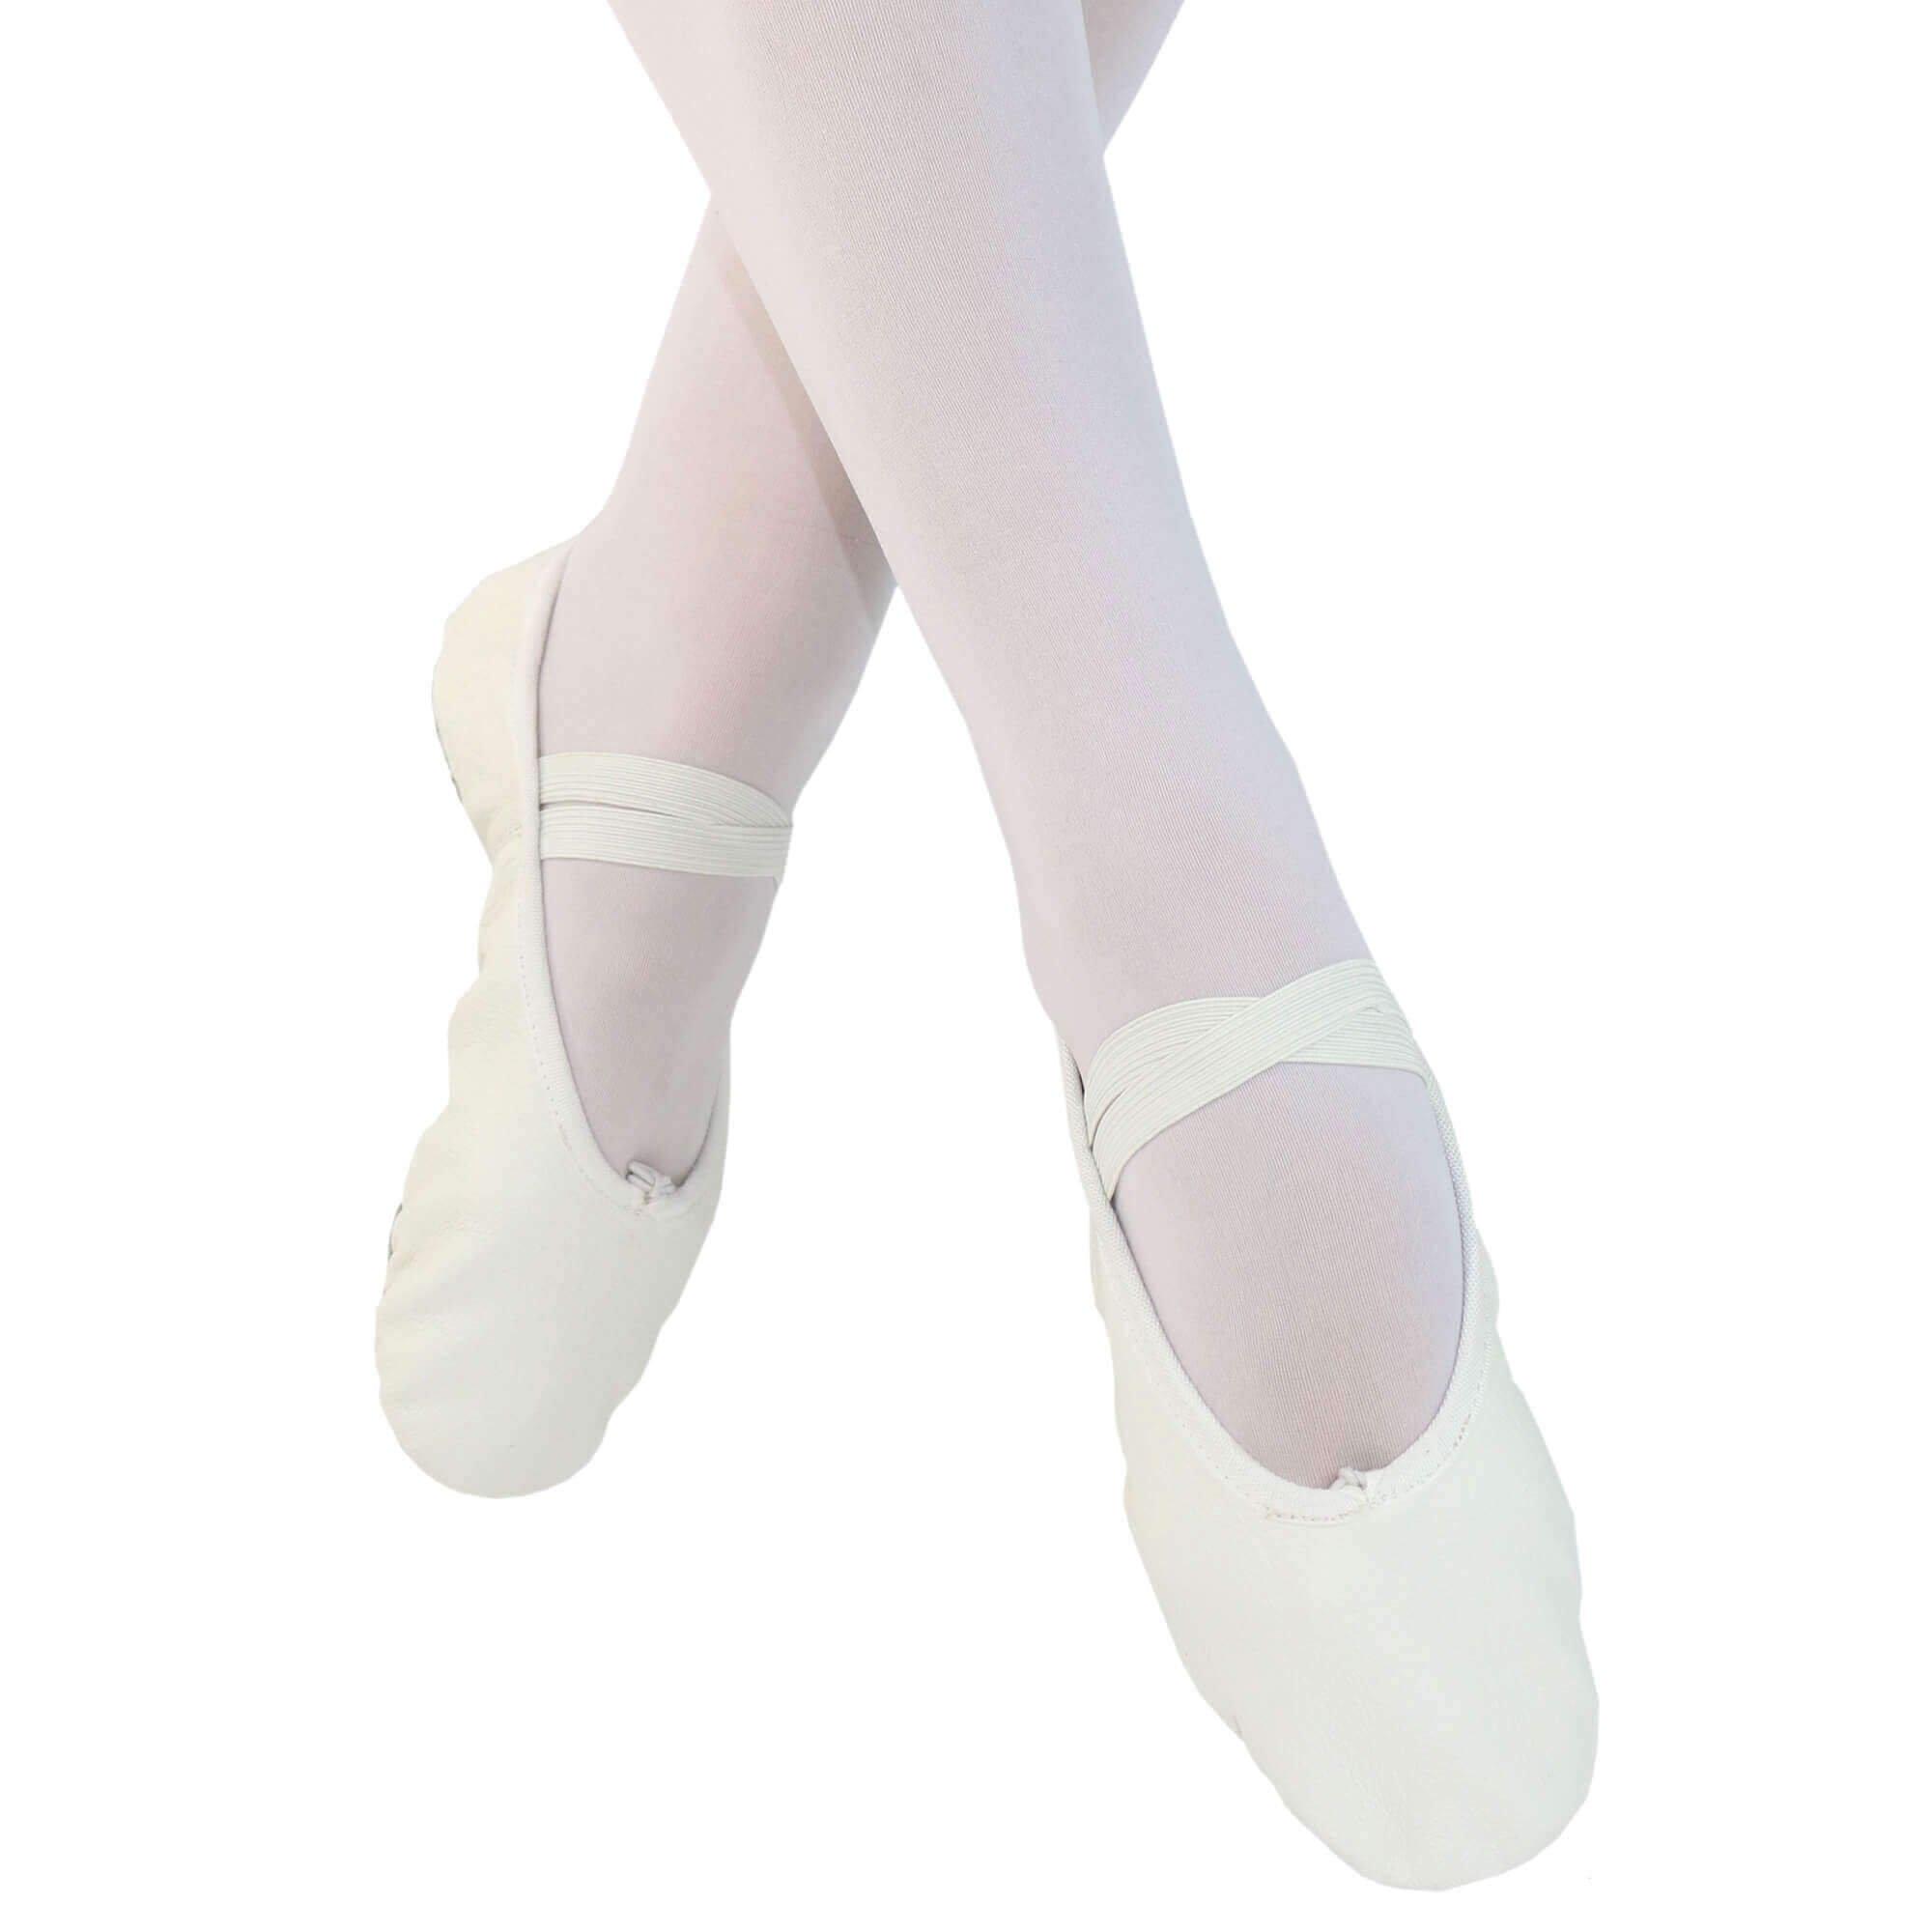 Danzcue Child Split Sole Leather White Ballet Slipper 12.5 M US